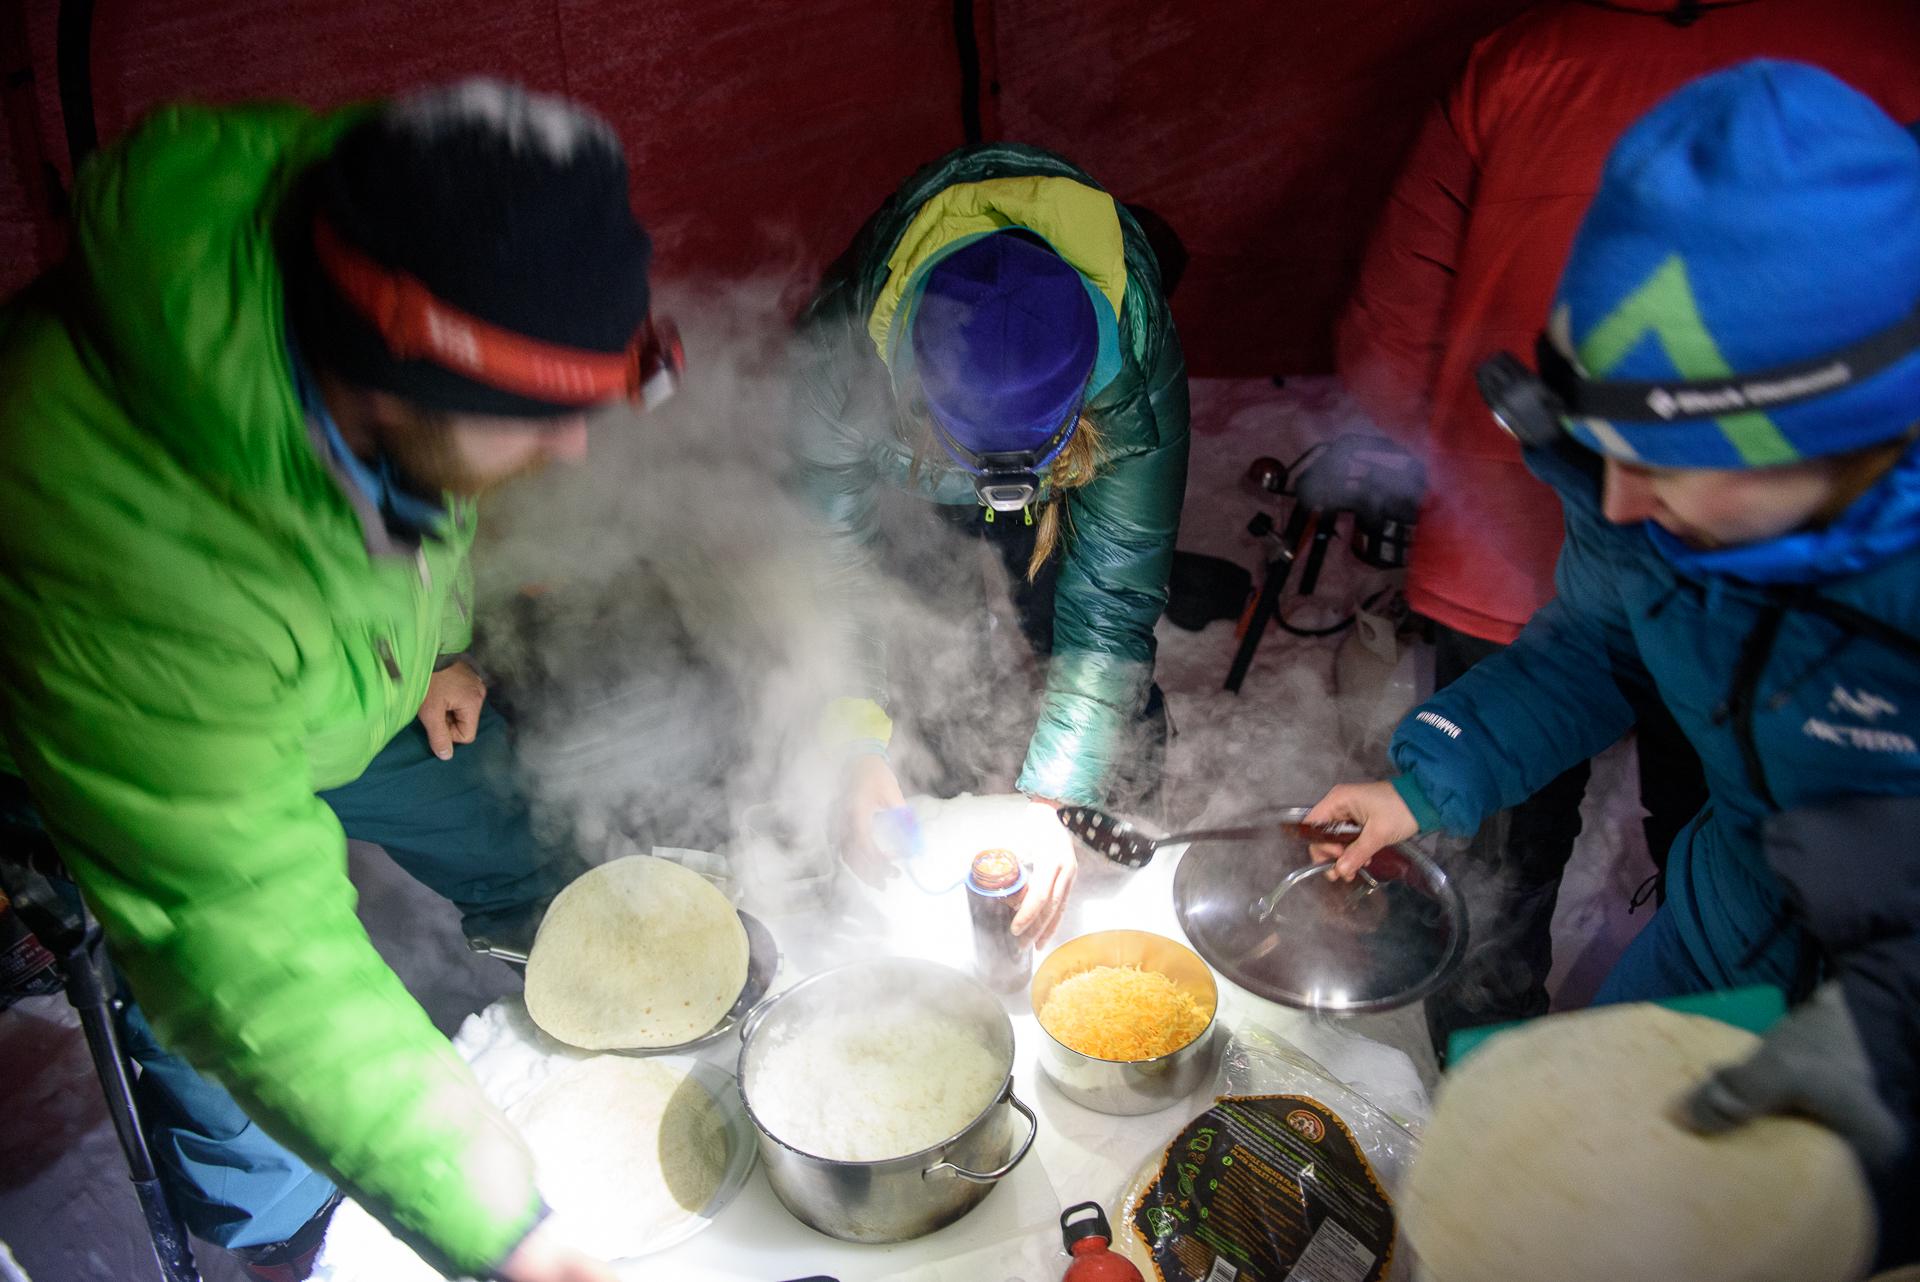 Burrito spread on our snow table. Photo Rich So